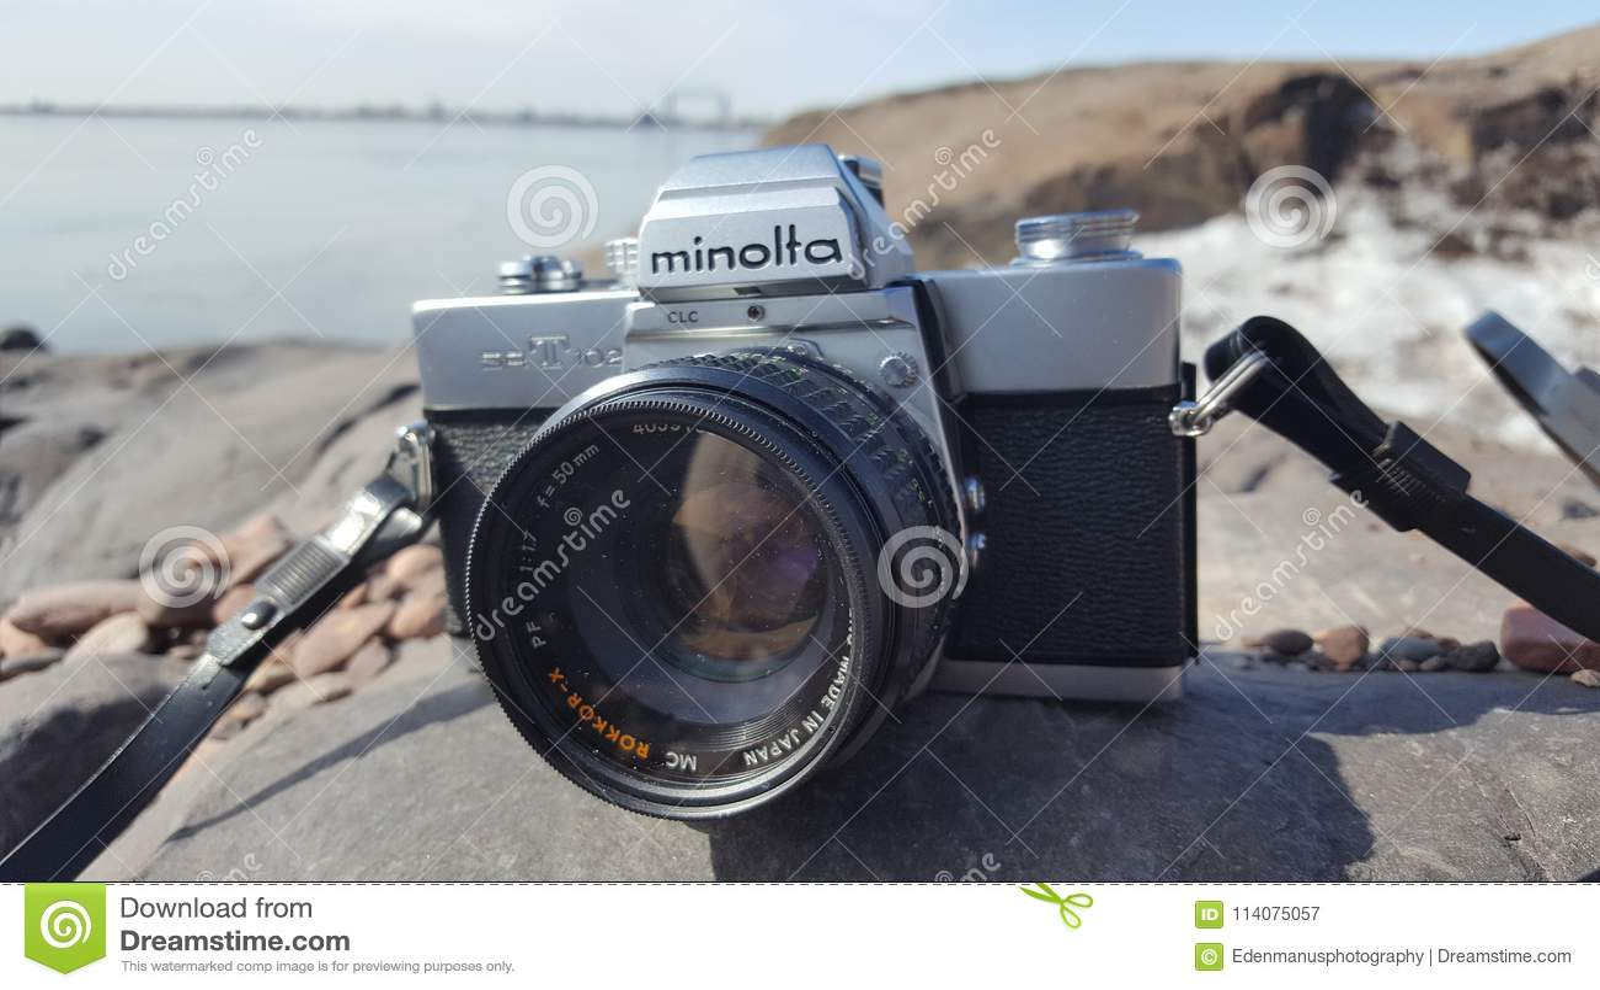 Minolta Srt 102 With 50mm F1 7 Rokkor Lens On Rocks Overlooking Lake